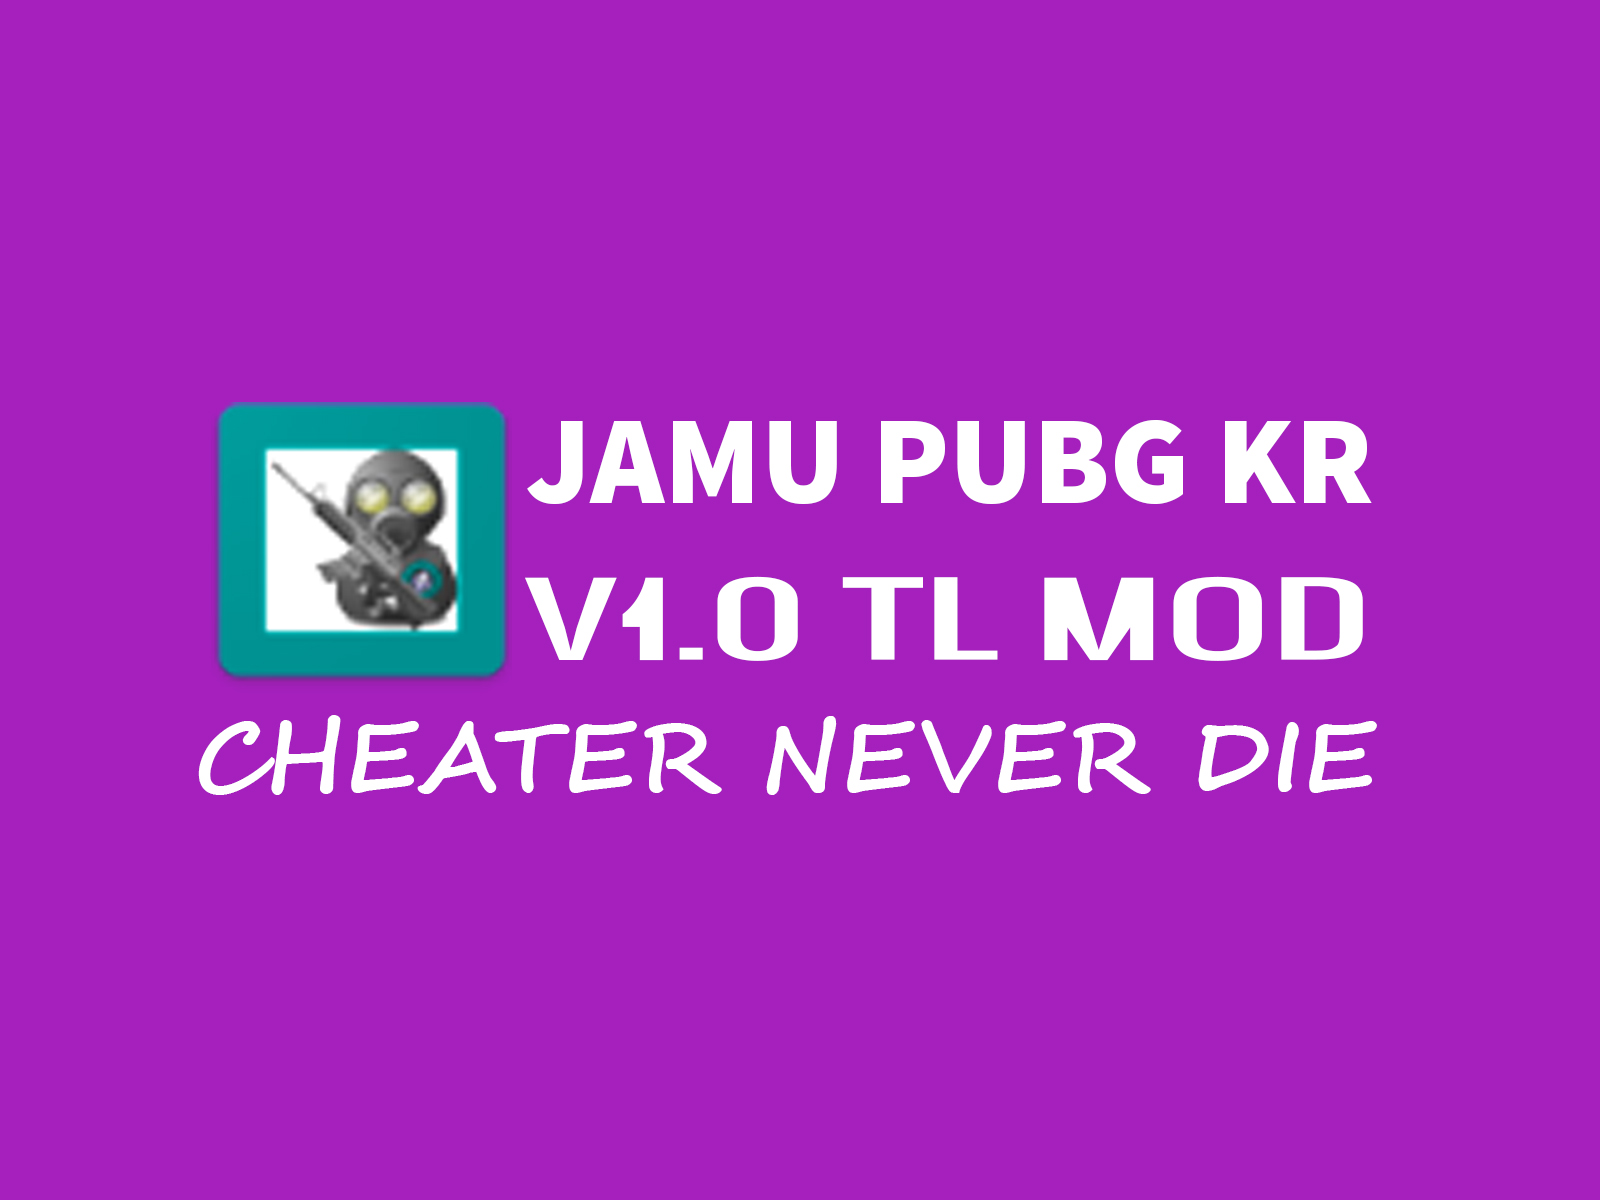 Jamu PUBG KR